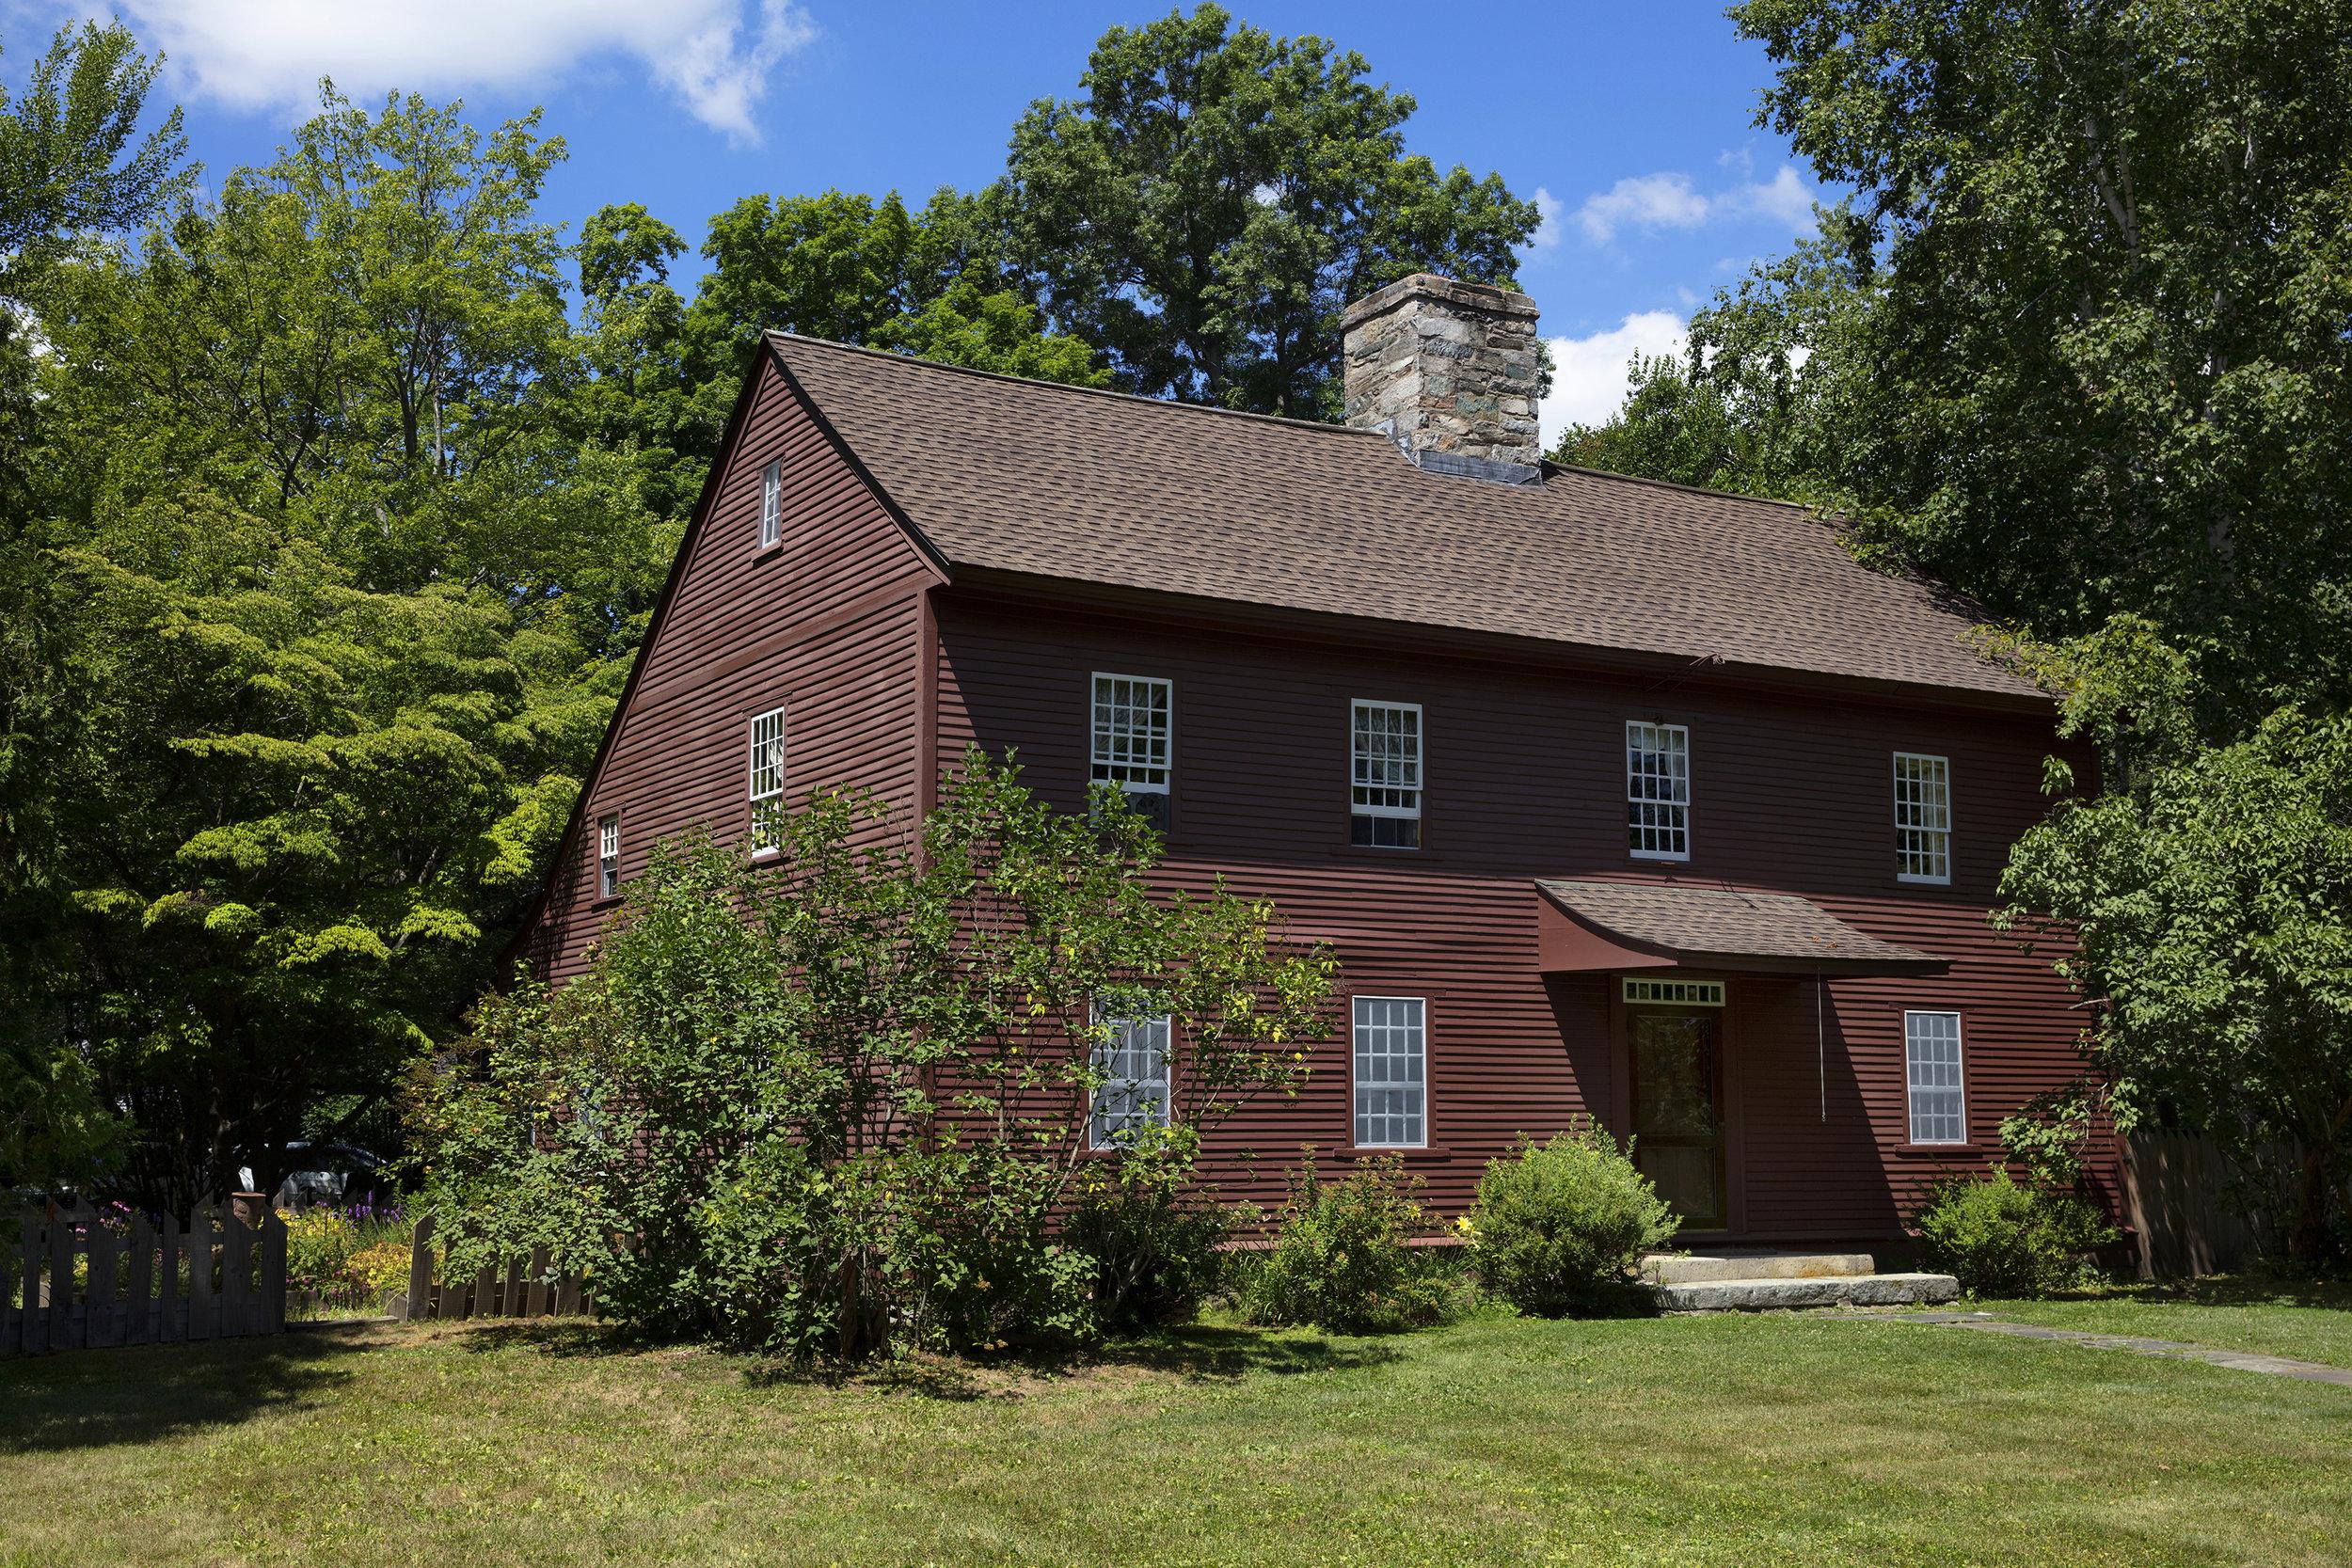 1682.Thomas Painter House. North Street Facade (1).Visko Hatfield.jpg